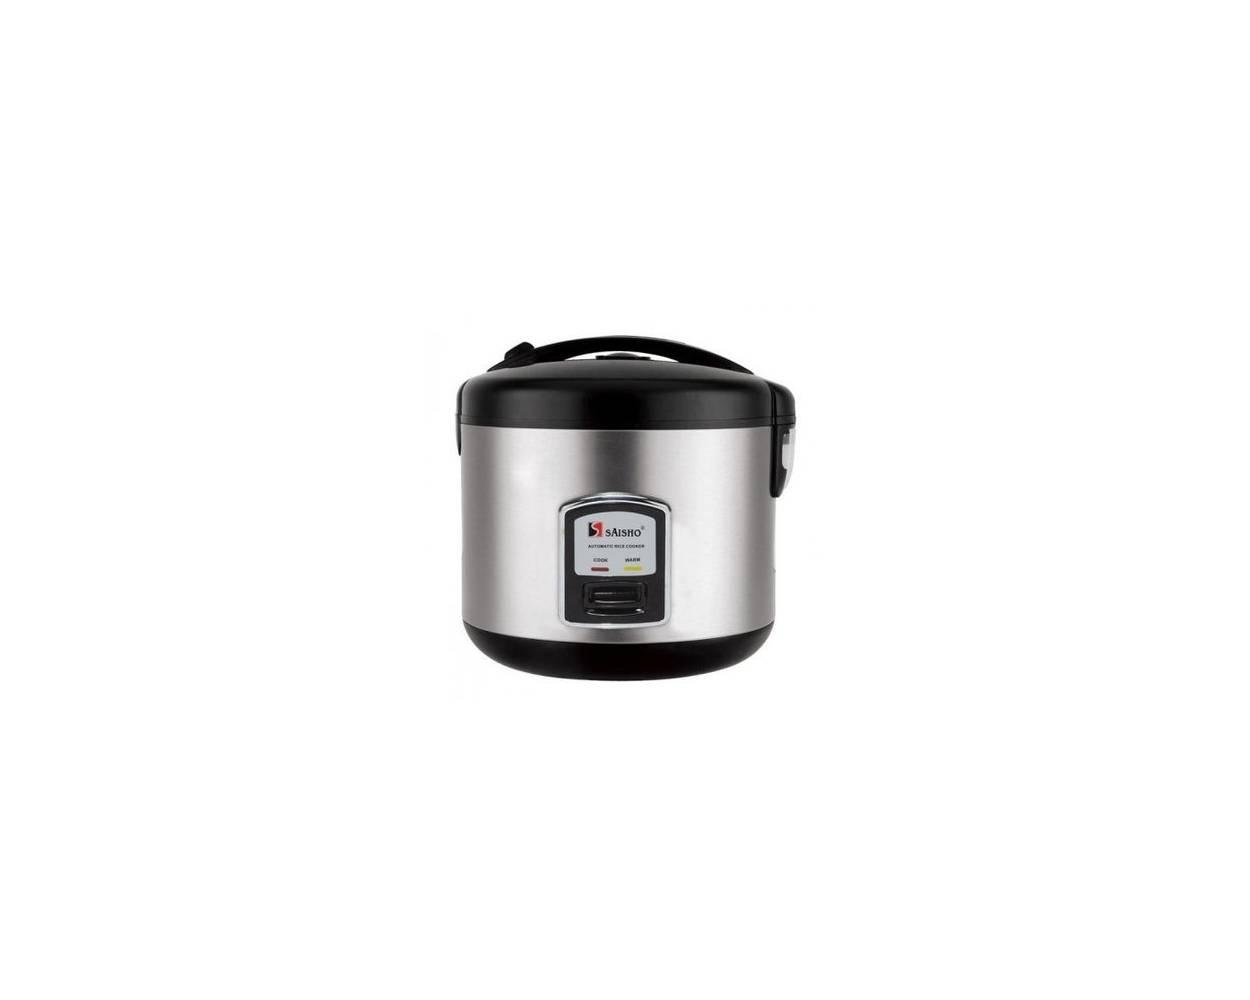 SAISHO S-406 Rice Cooker